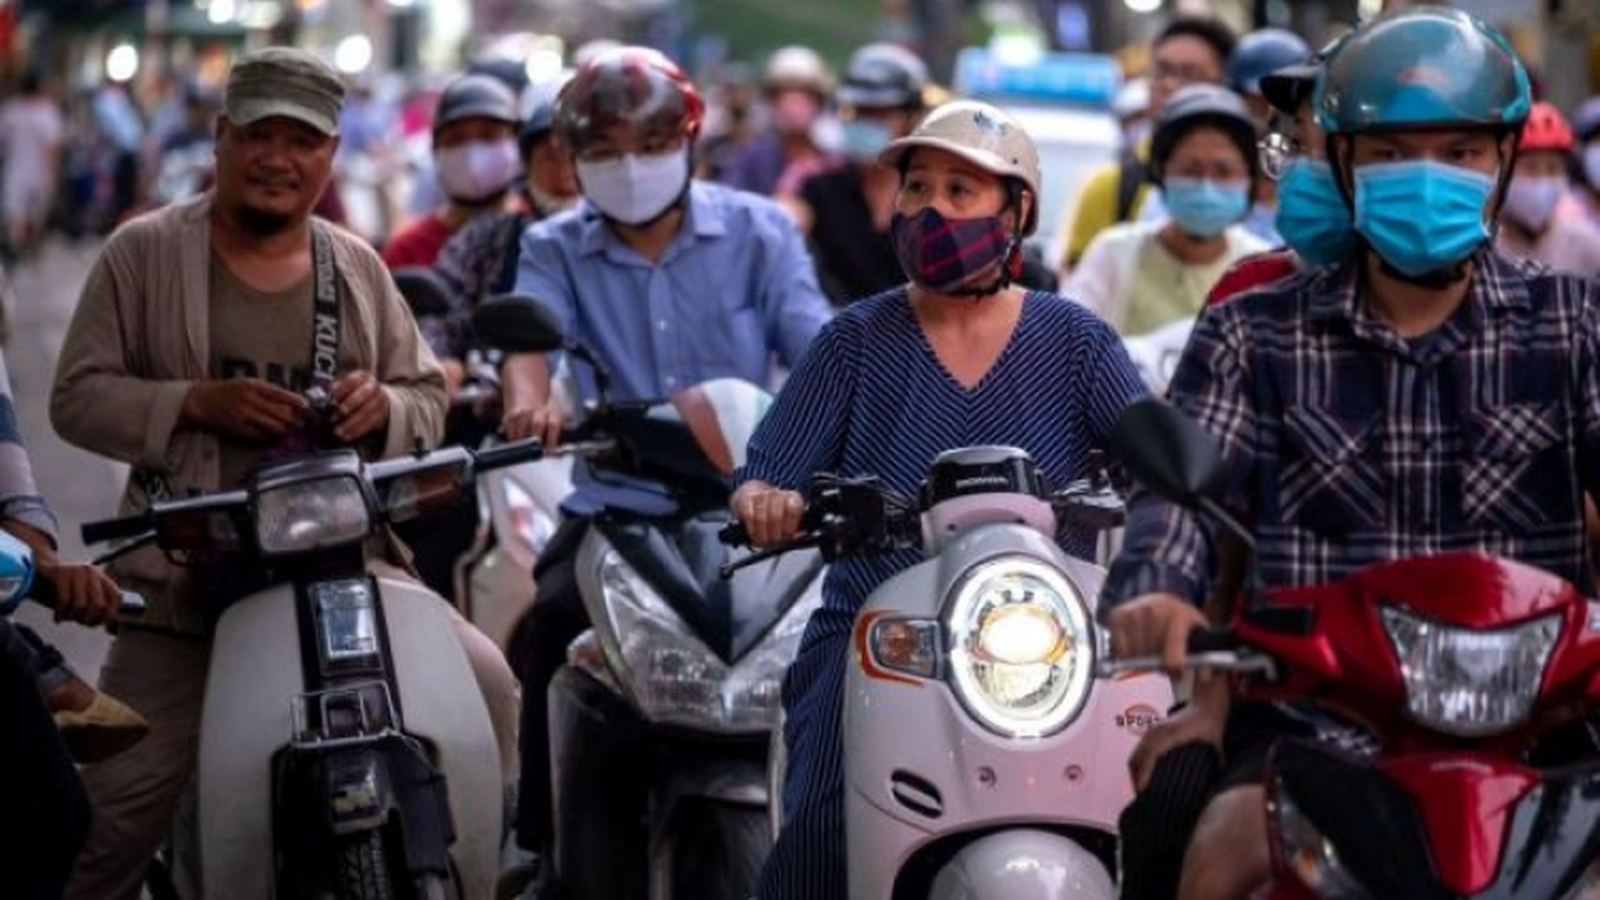 Telegraph: Vietnam takes pride in beating COVID-19 twice